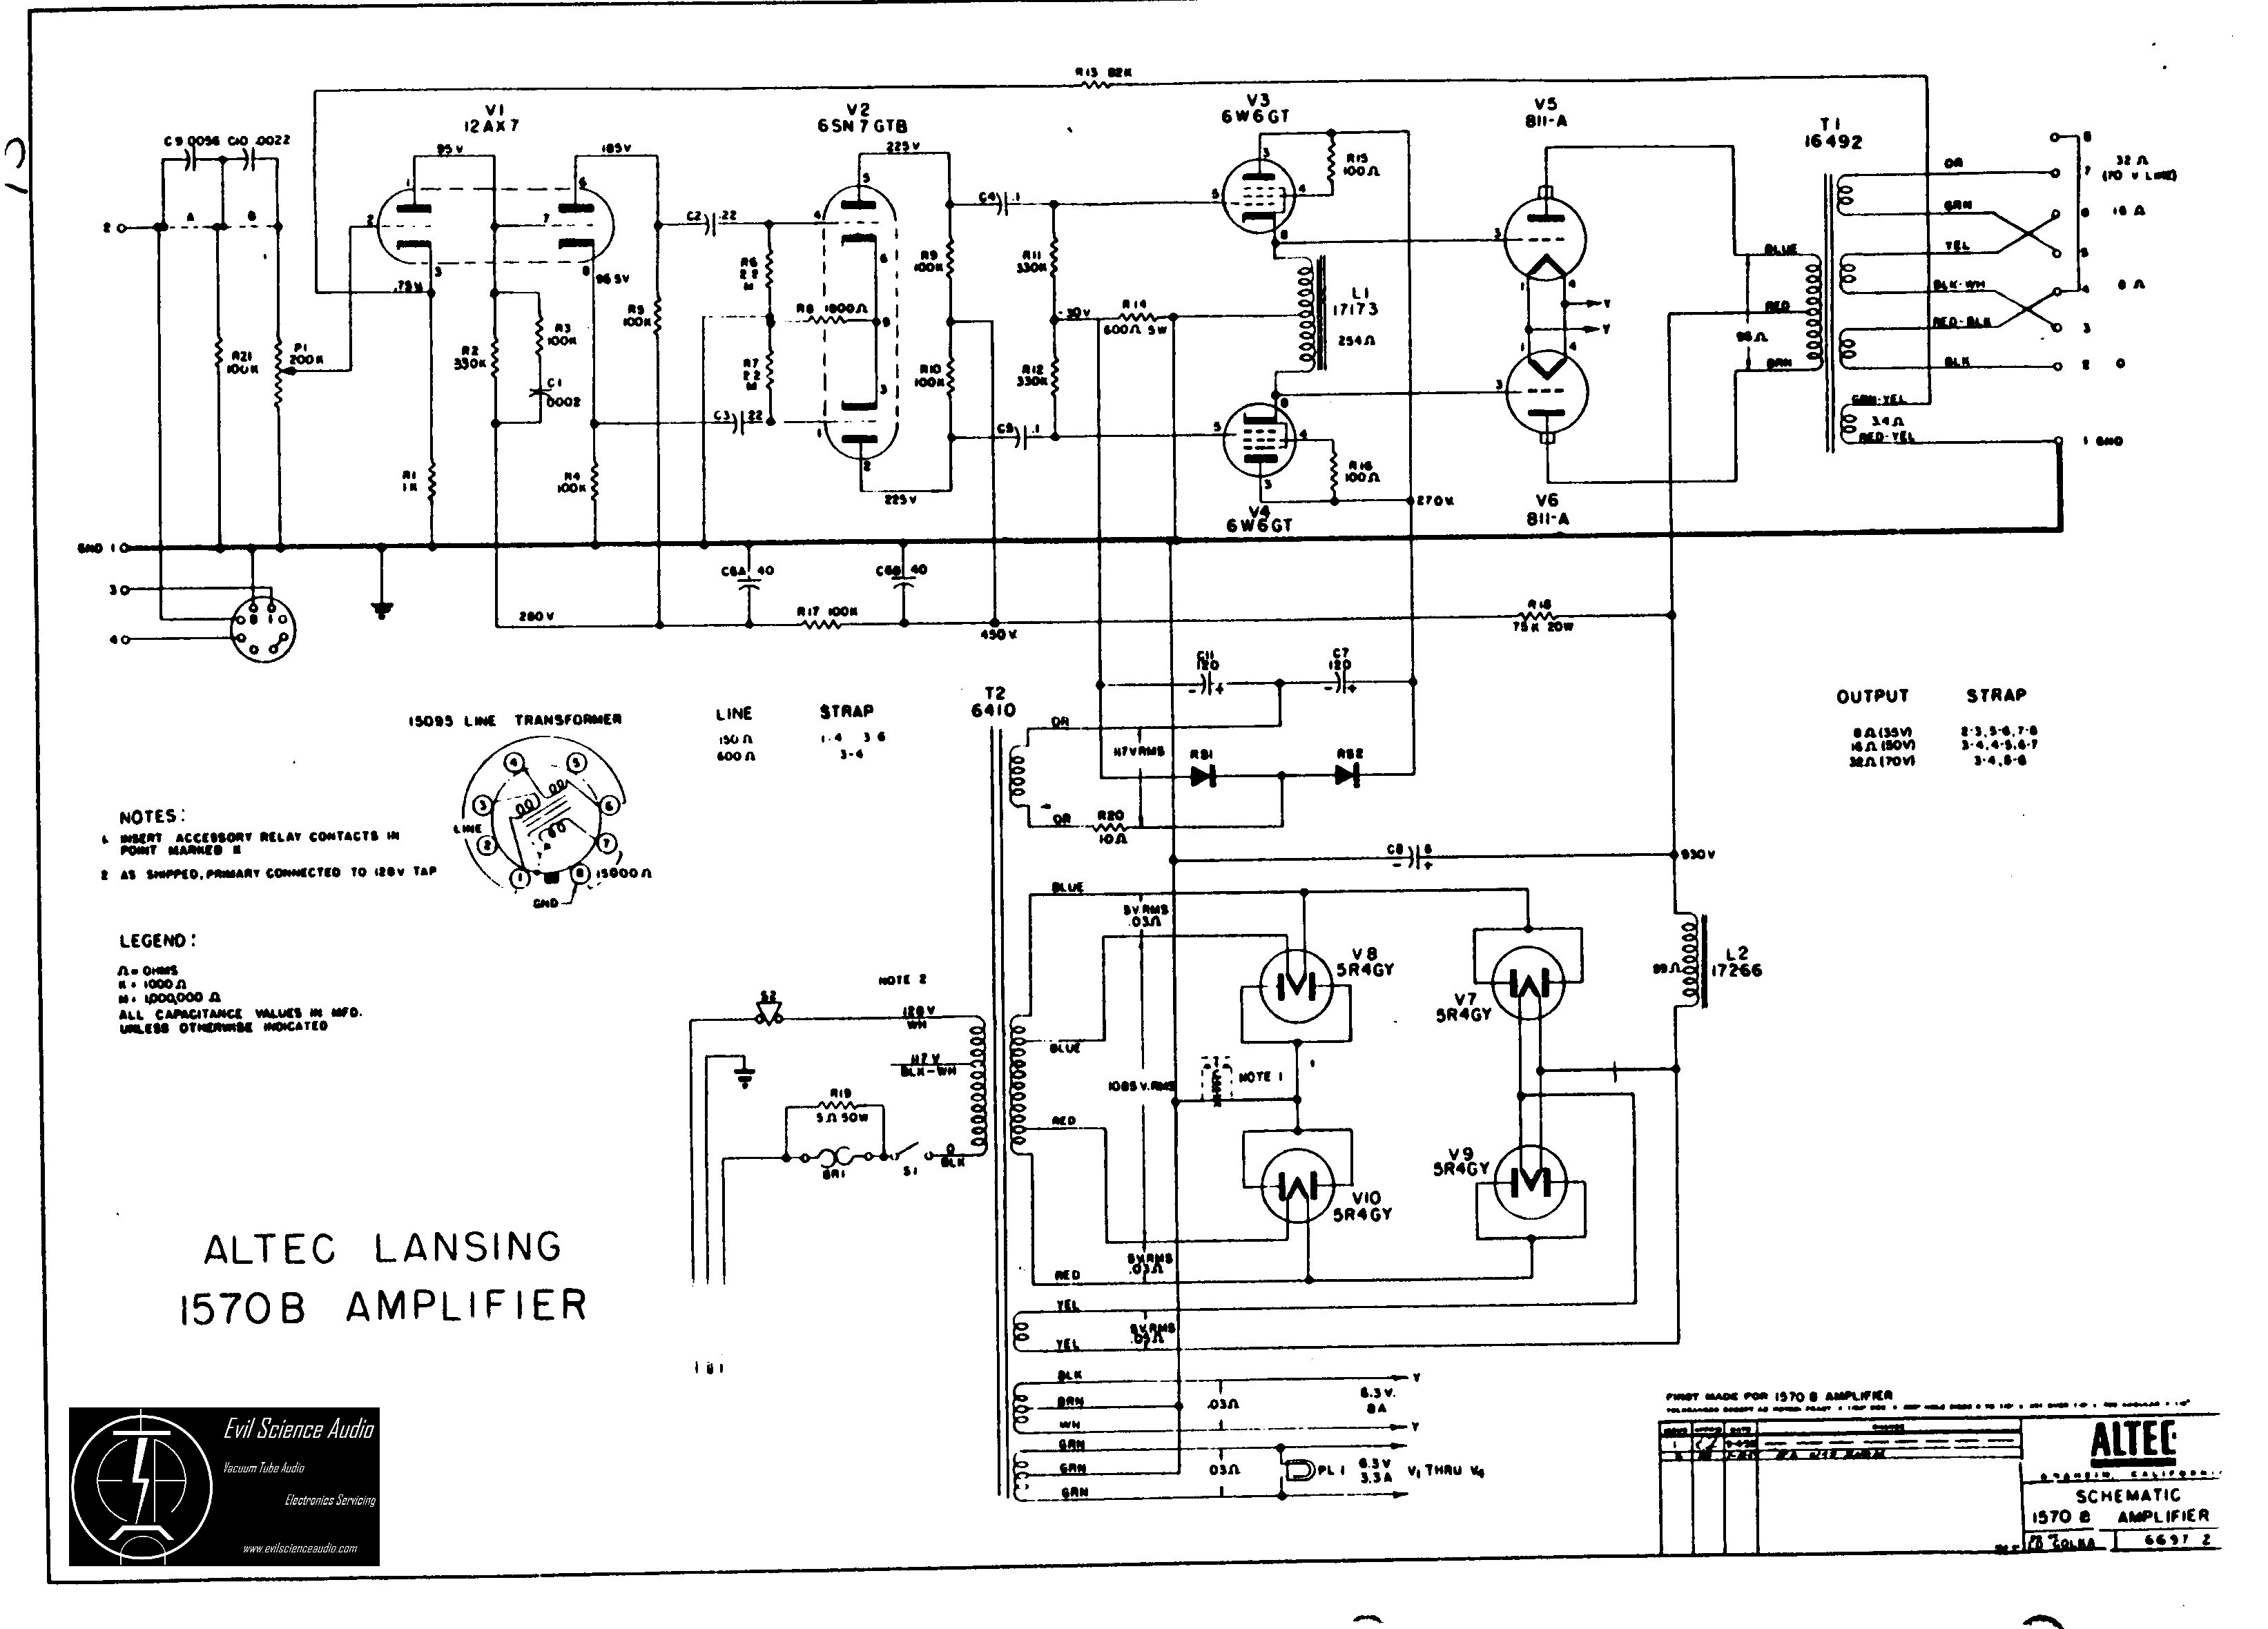 acs295 wiring diagram cua jenouson uk \u2022 Kama Wiring Diagram acs295 wiring diagram wiring diagram rh a8 ansolsolder co light switch wiring diagram basic electrical wiring